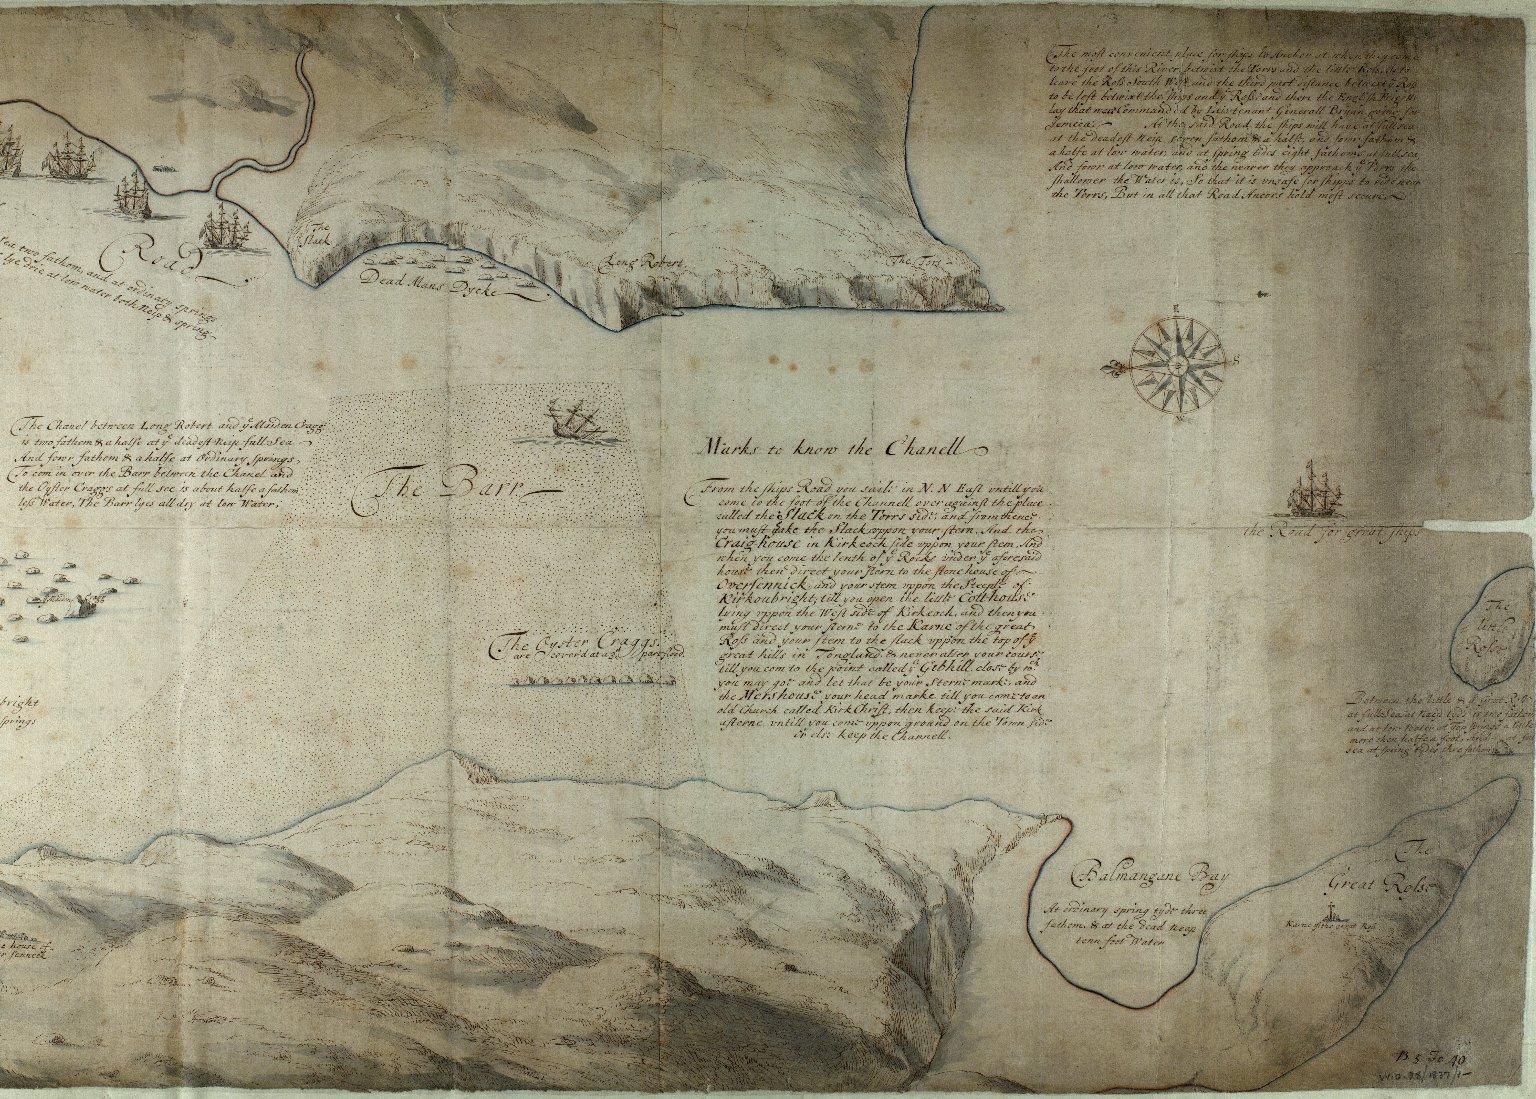 Kirckoubright Ano 1684 [1711 copy] [2 of 2]